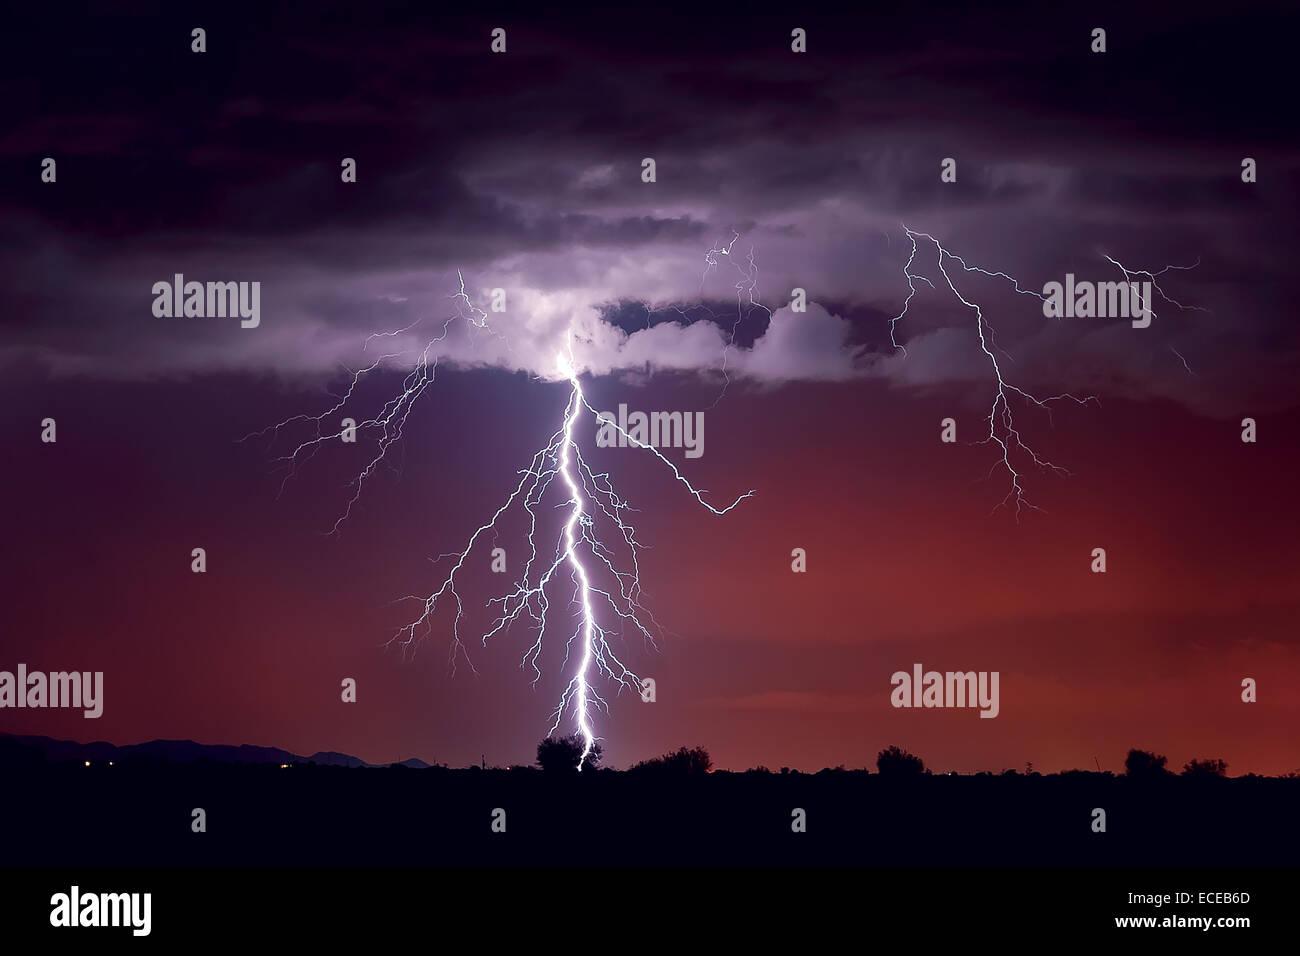 Lightning striking a tree, Arlington, Arizona, america, USA - Stock Image